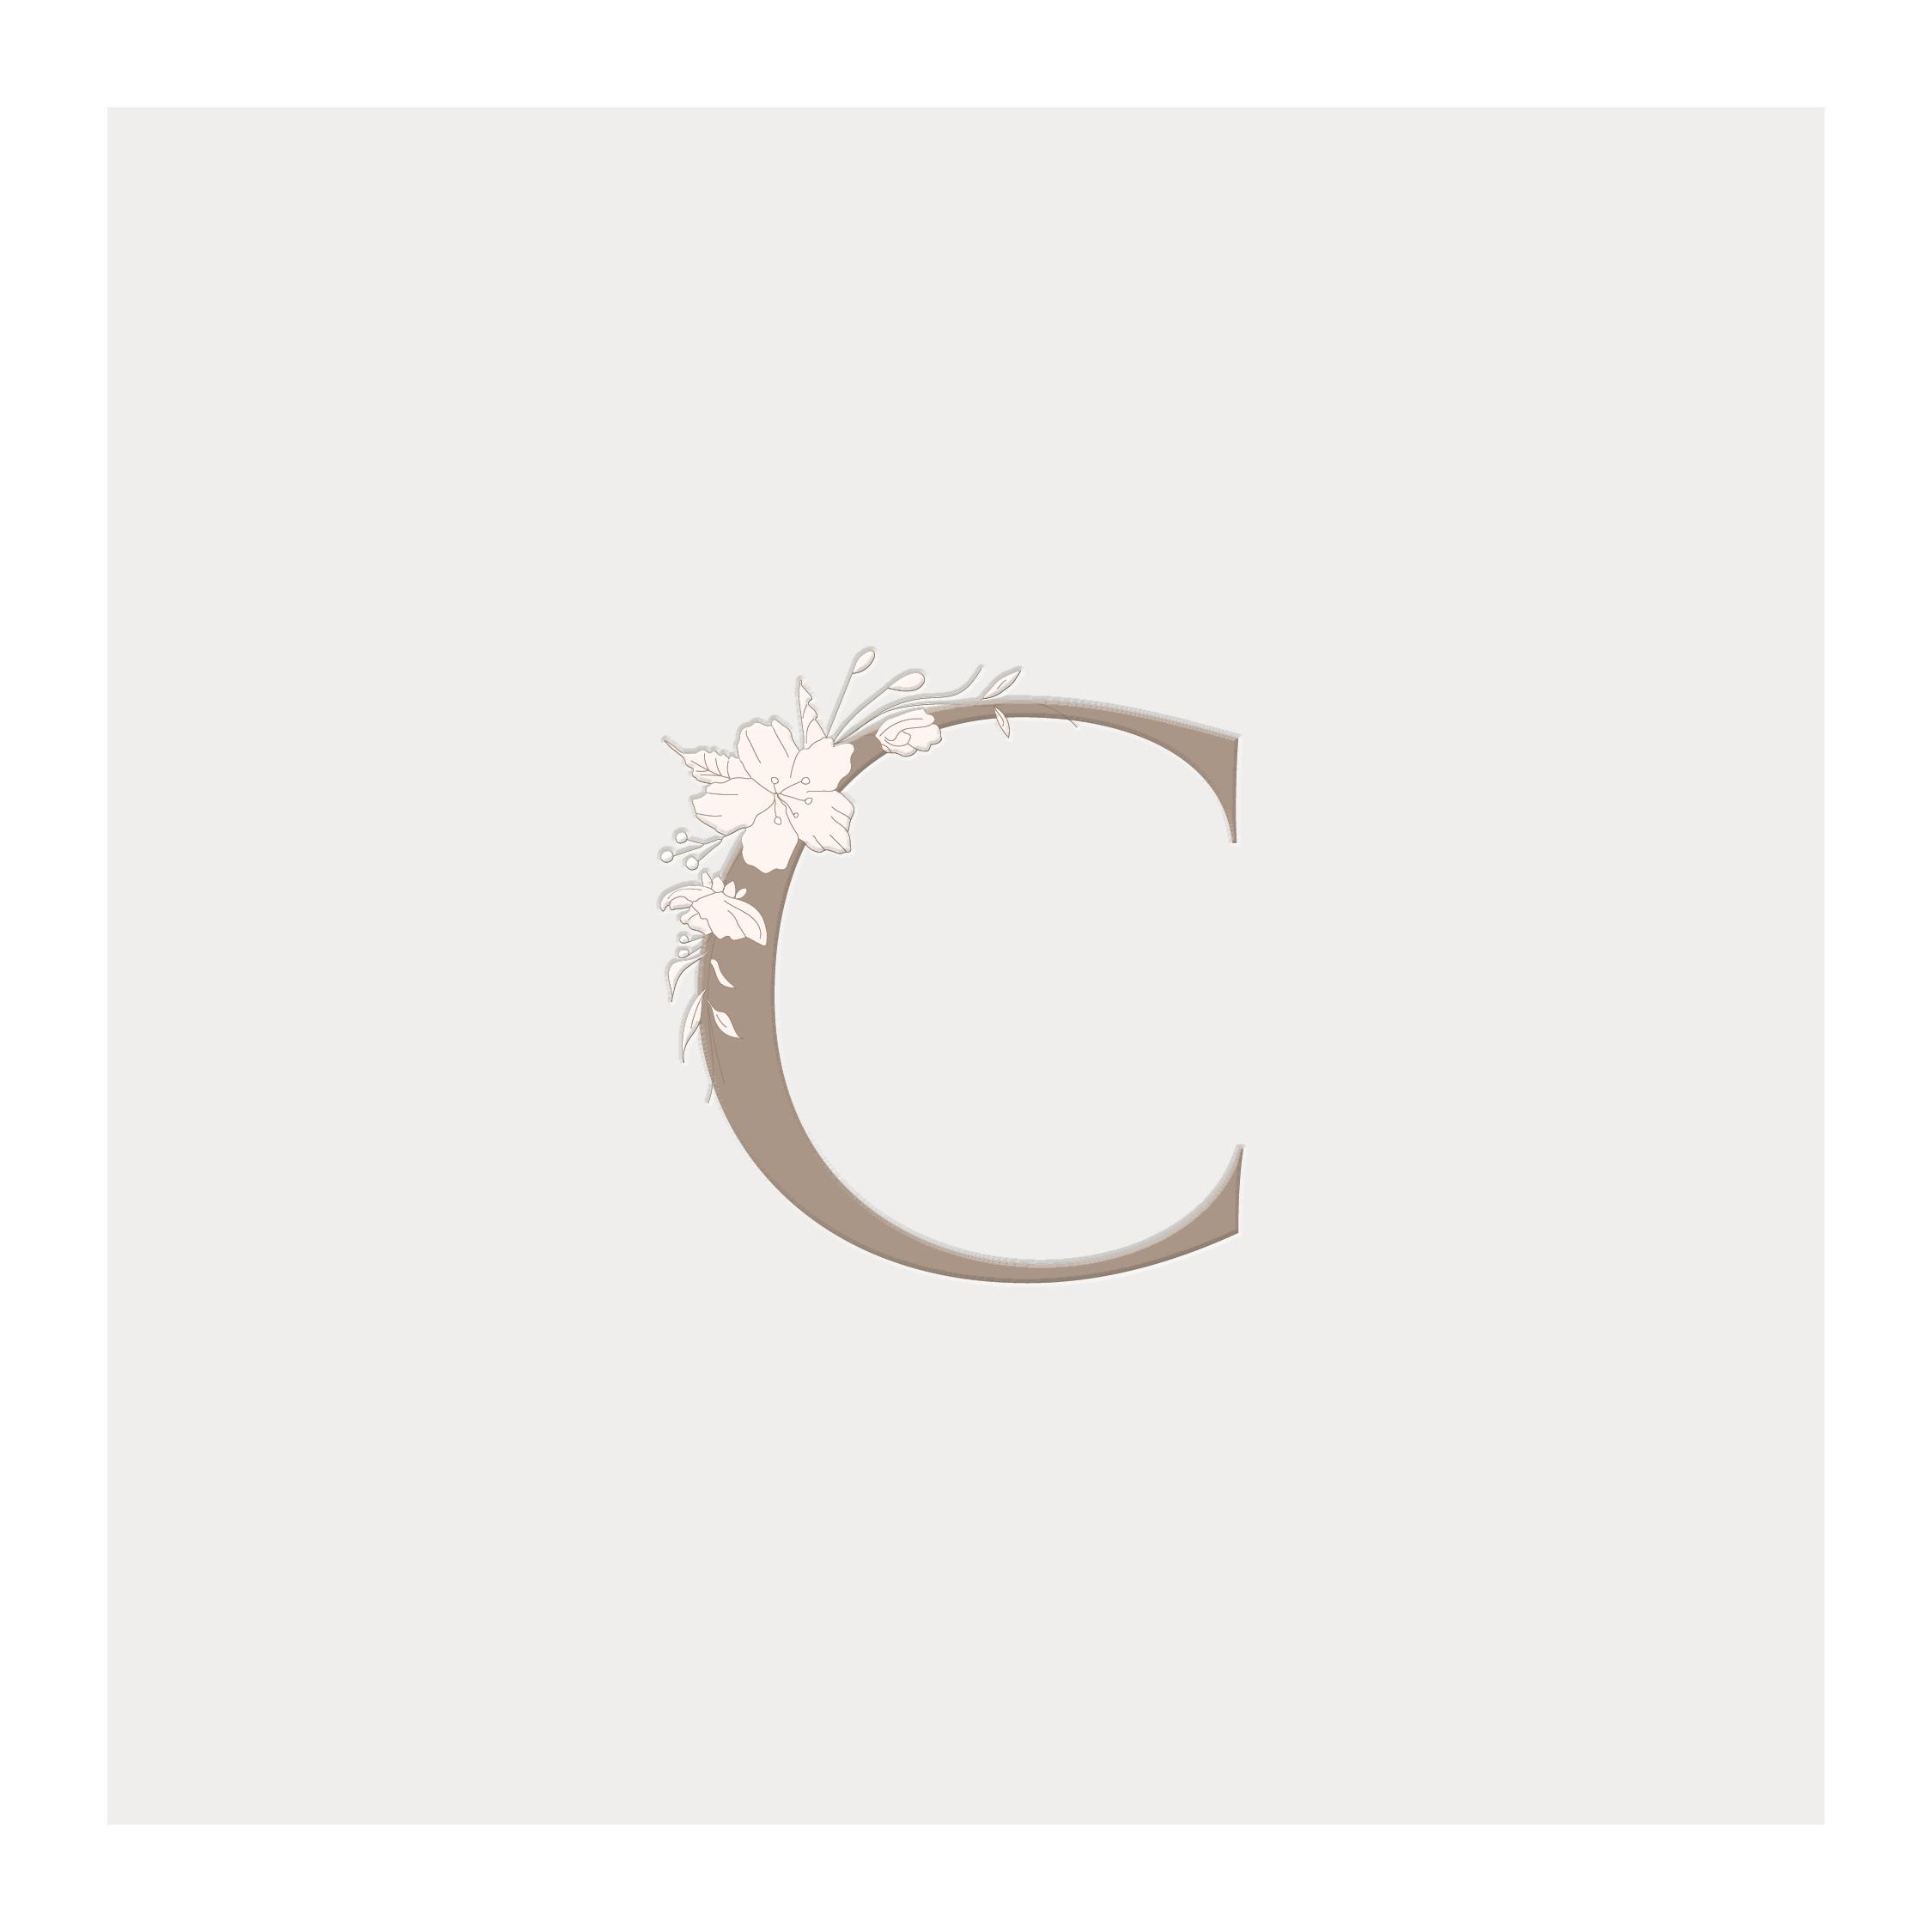 Clementine Insta squares9.jpg